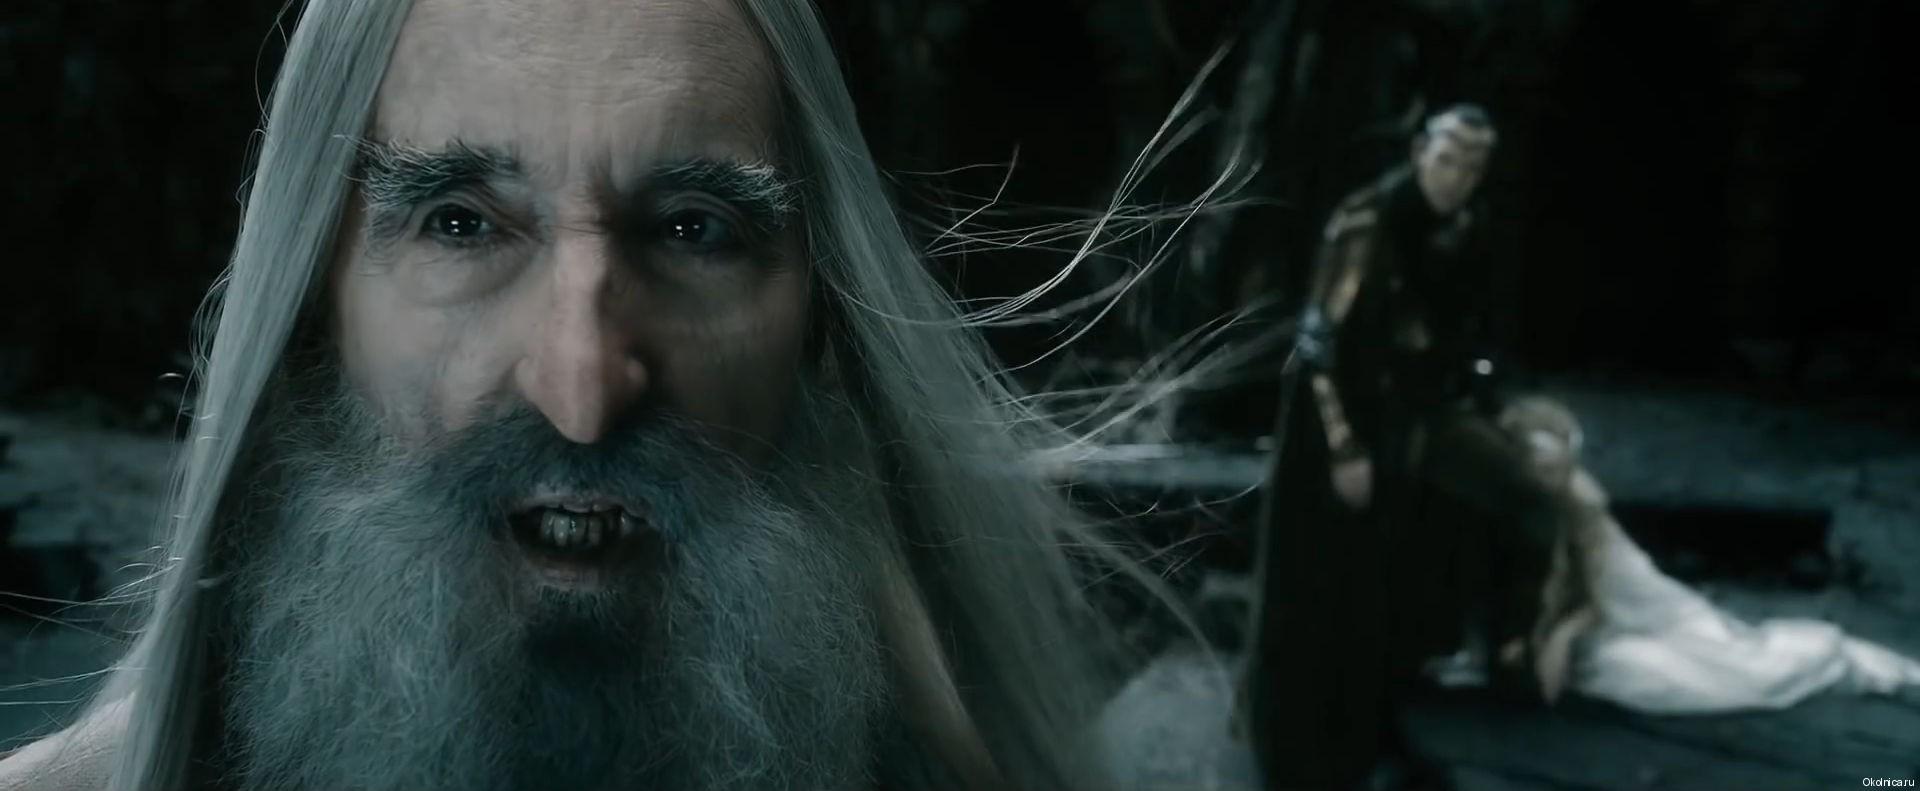 Kino_Hobbit_Bitva_pyati_voinstv_36